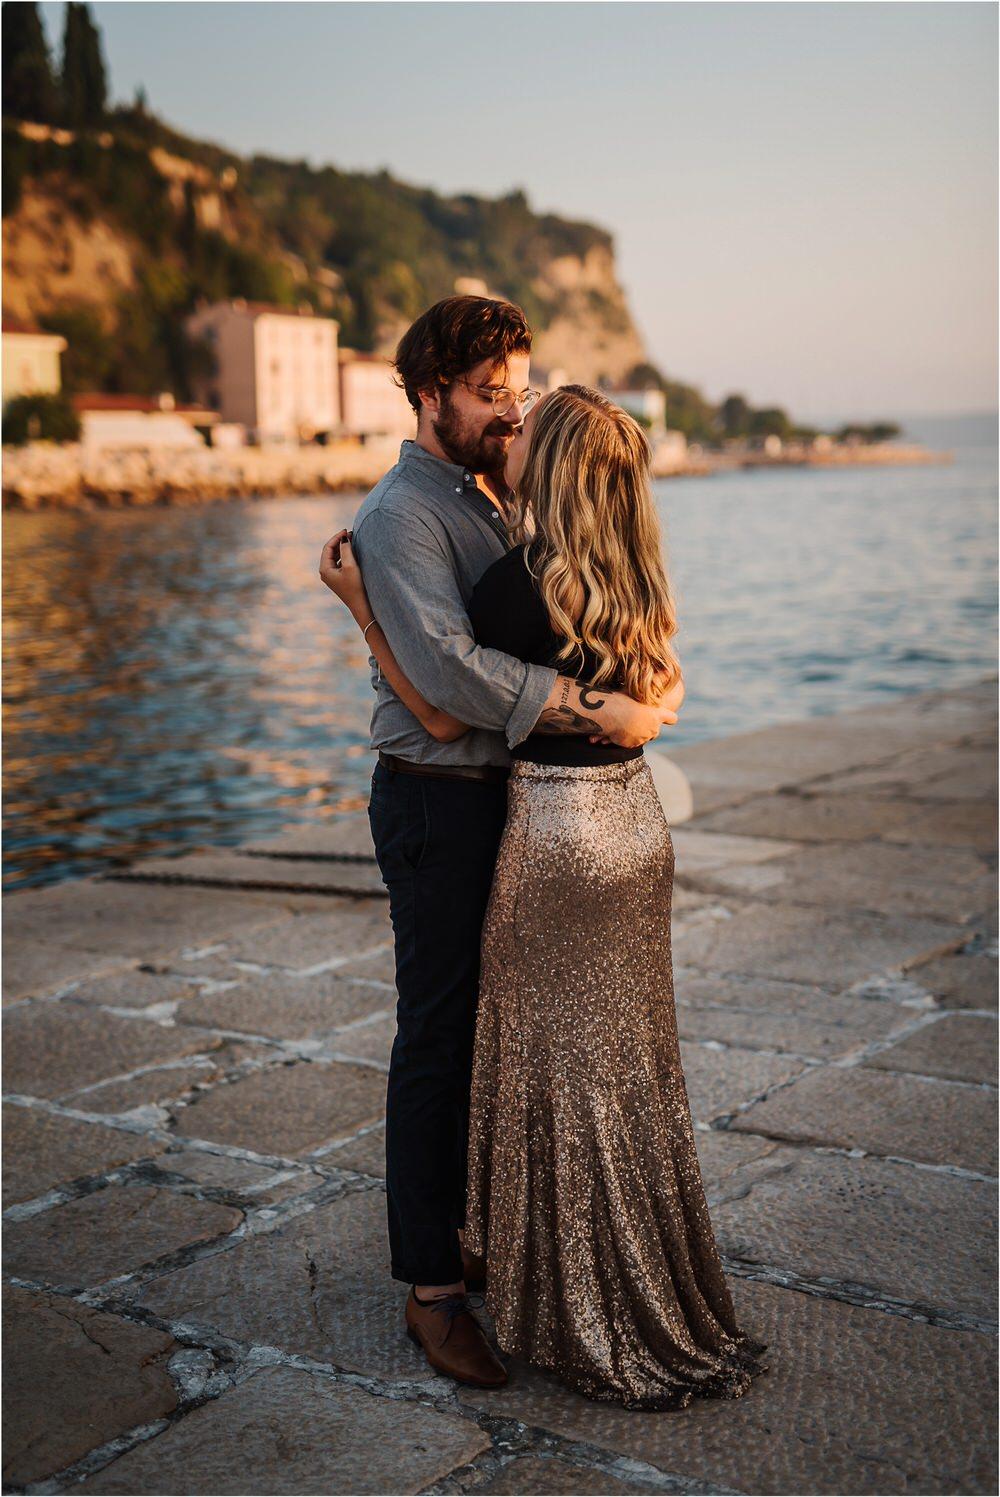 piran wedding photographer engagement anniversary honeymoon photography recommended slovenia seaside photographer  0035.jpg